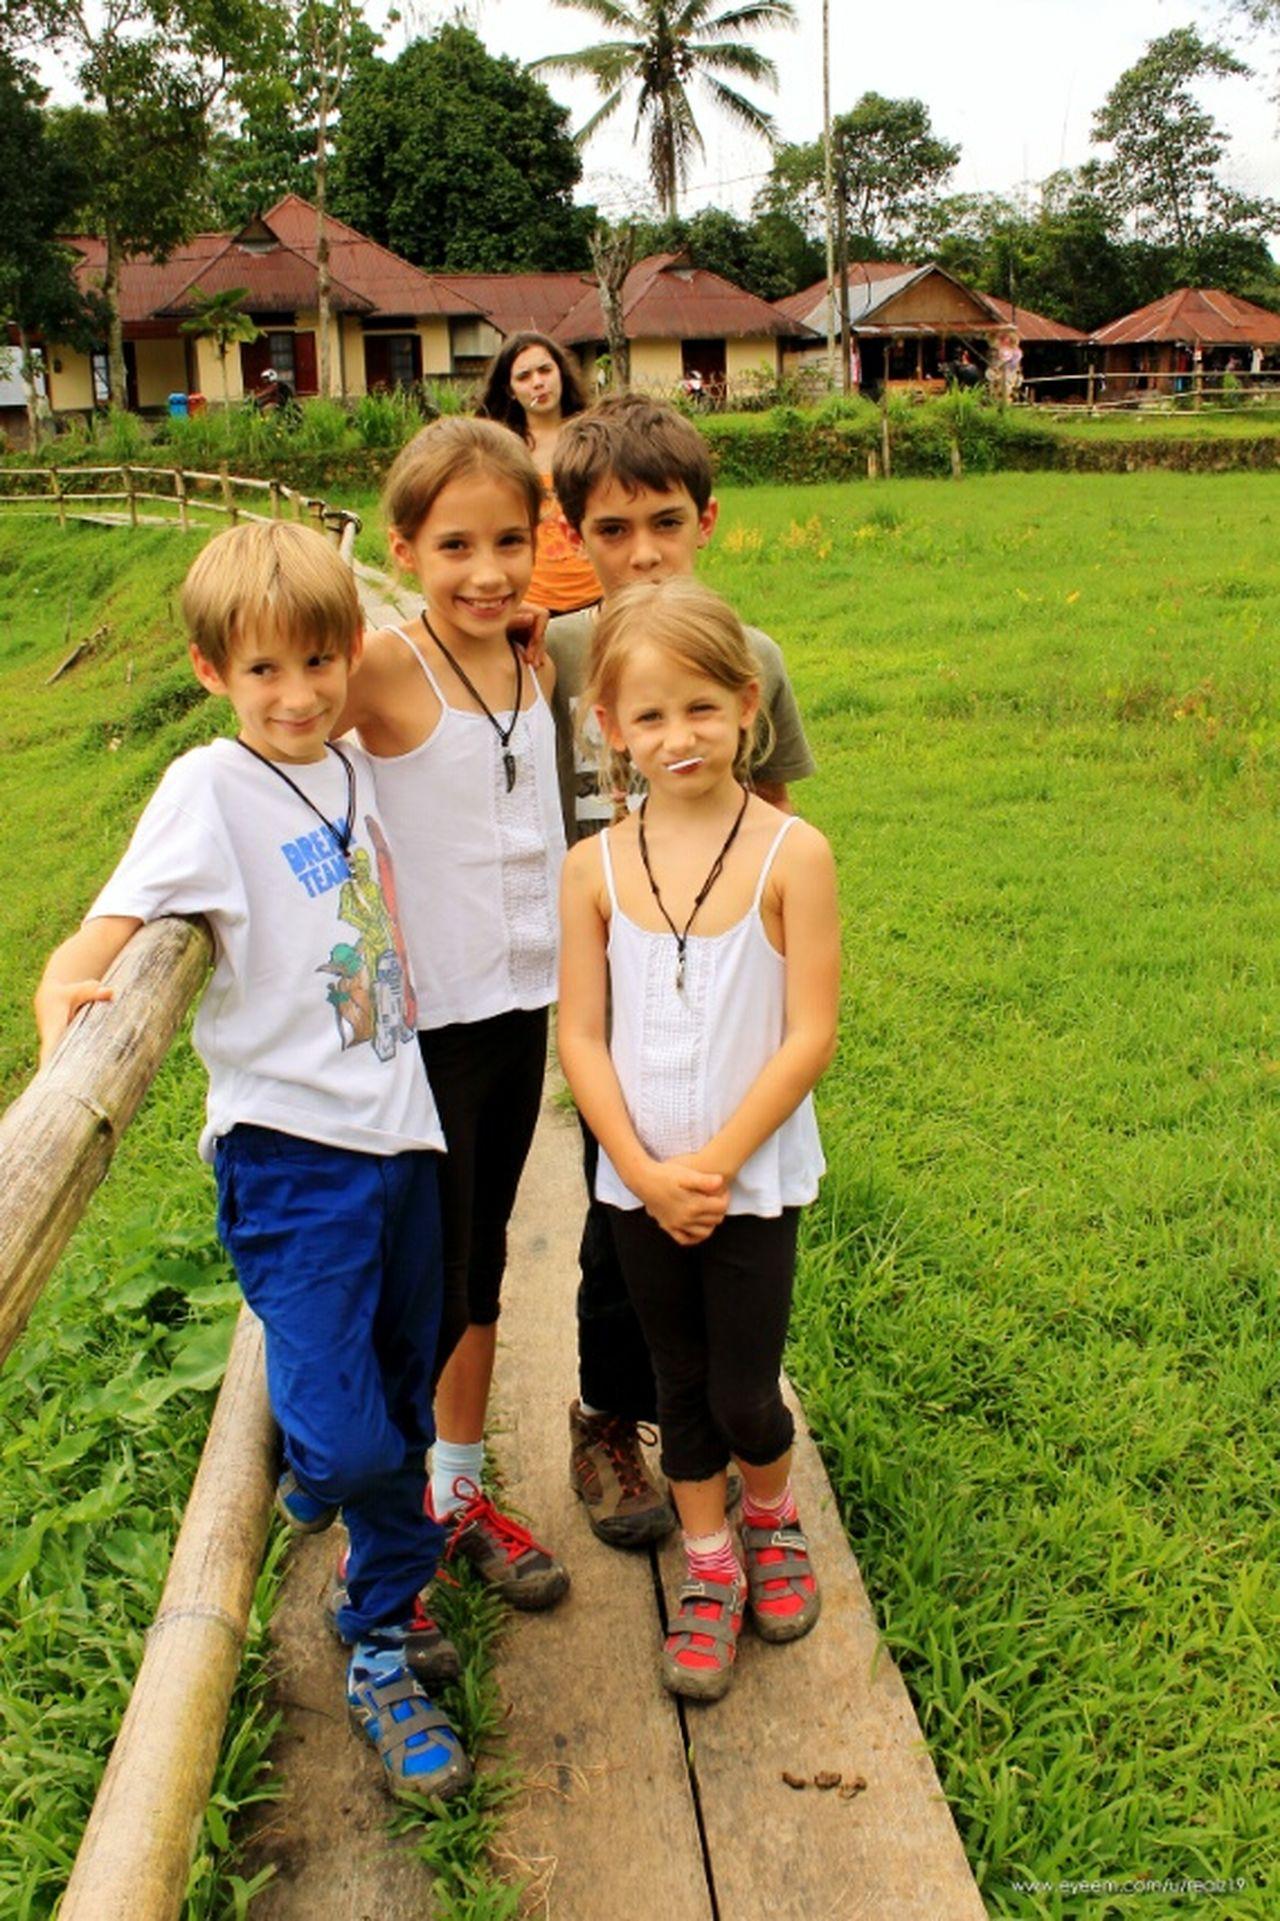 Kids Tourist Green Green Grass Kete Kesu Toraja Utara Rantepao Toraja Travel Destinations Outdoors INDONESIA